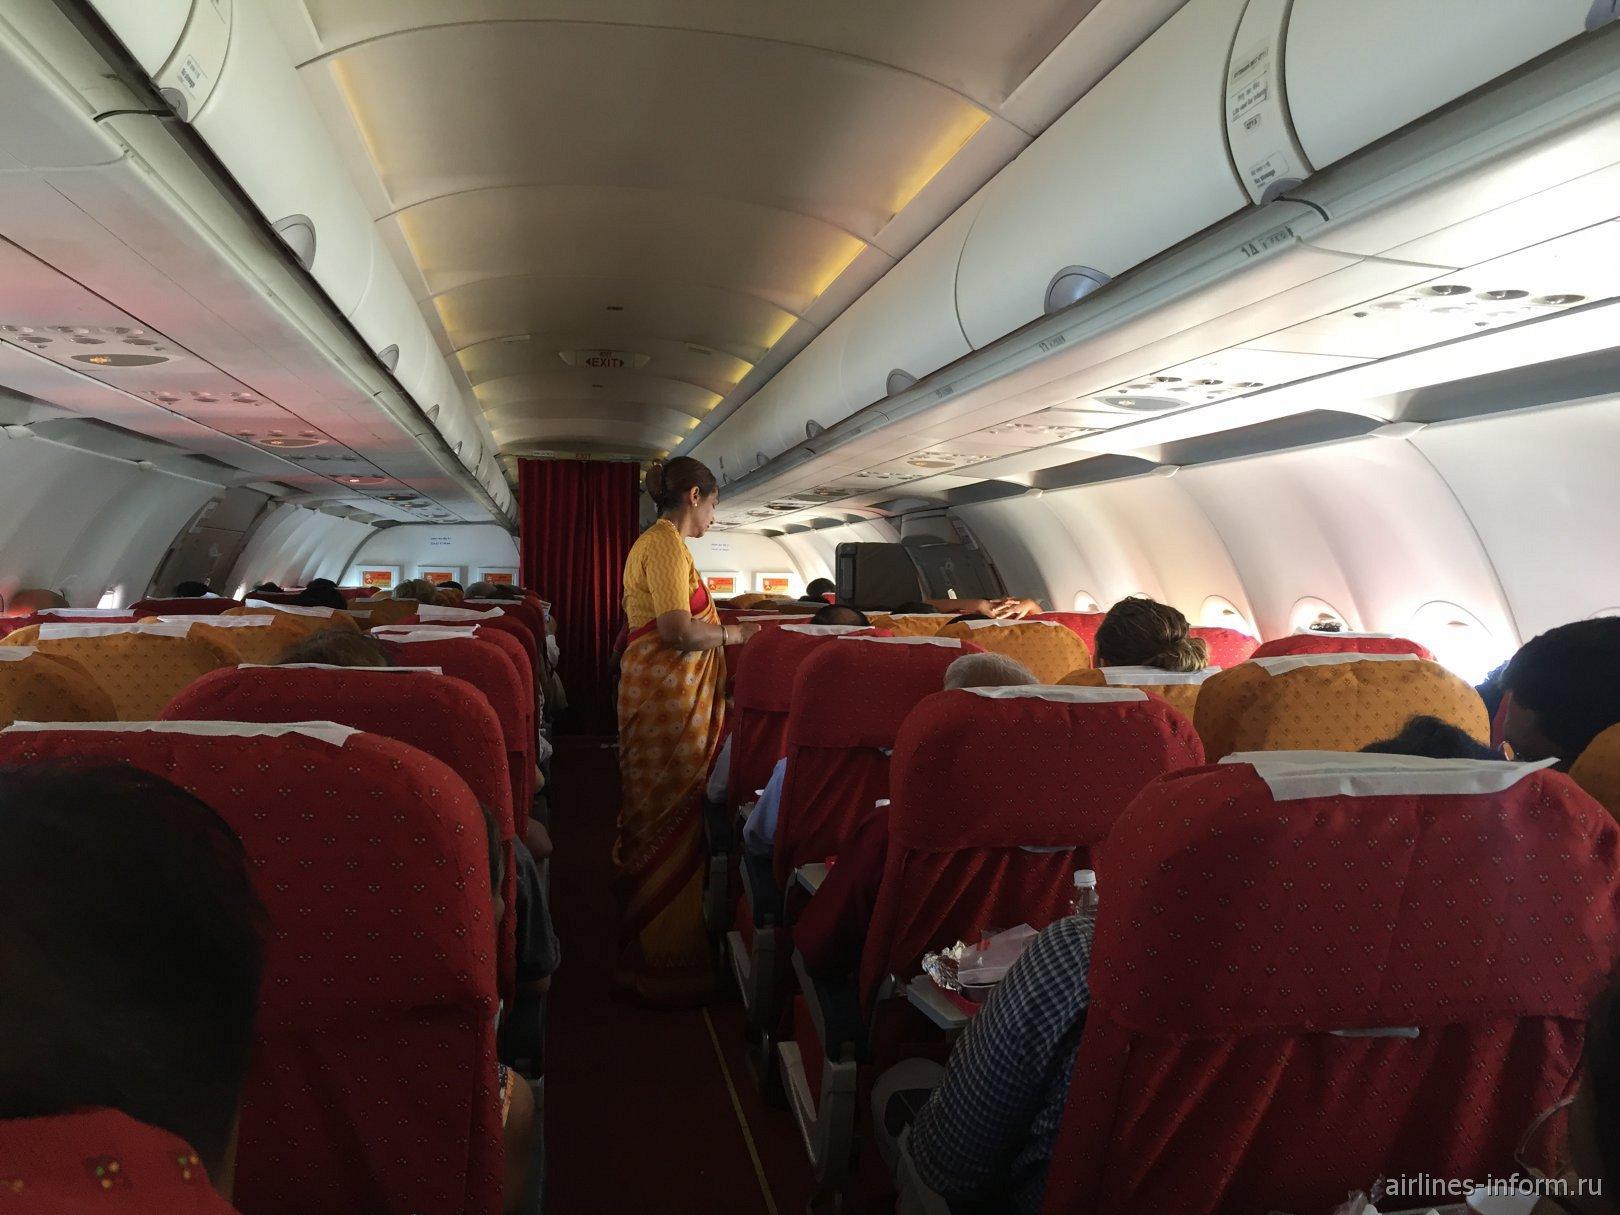 Пассажирский салон самолета Airbus A321 авиакомпании Air India